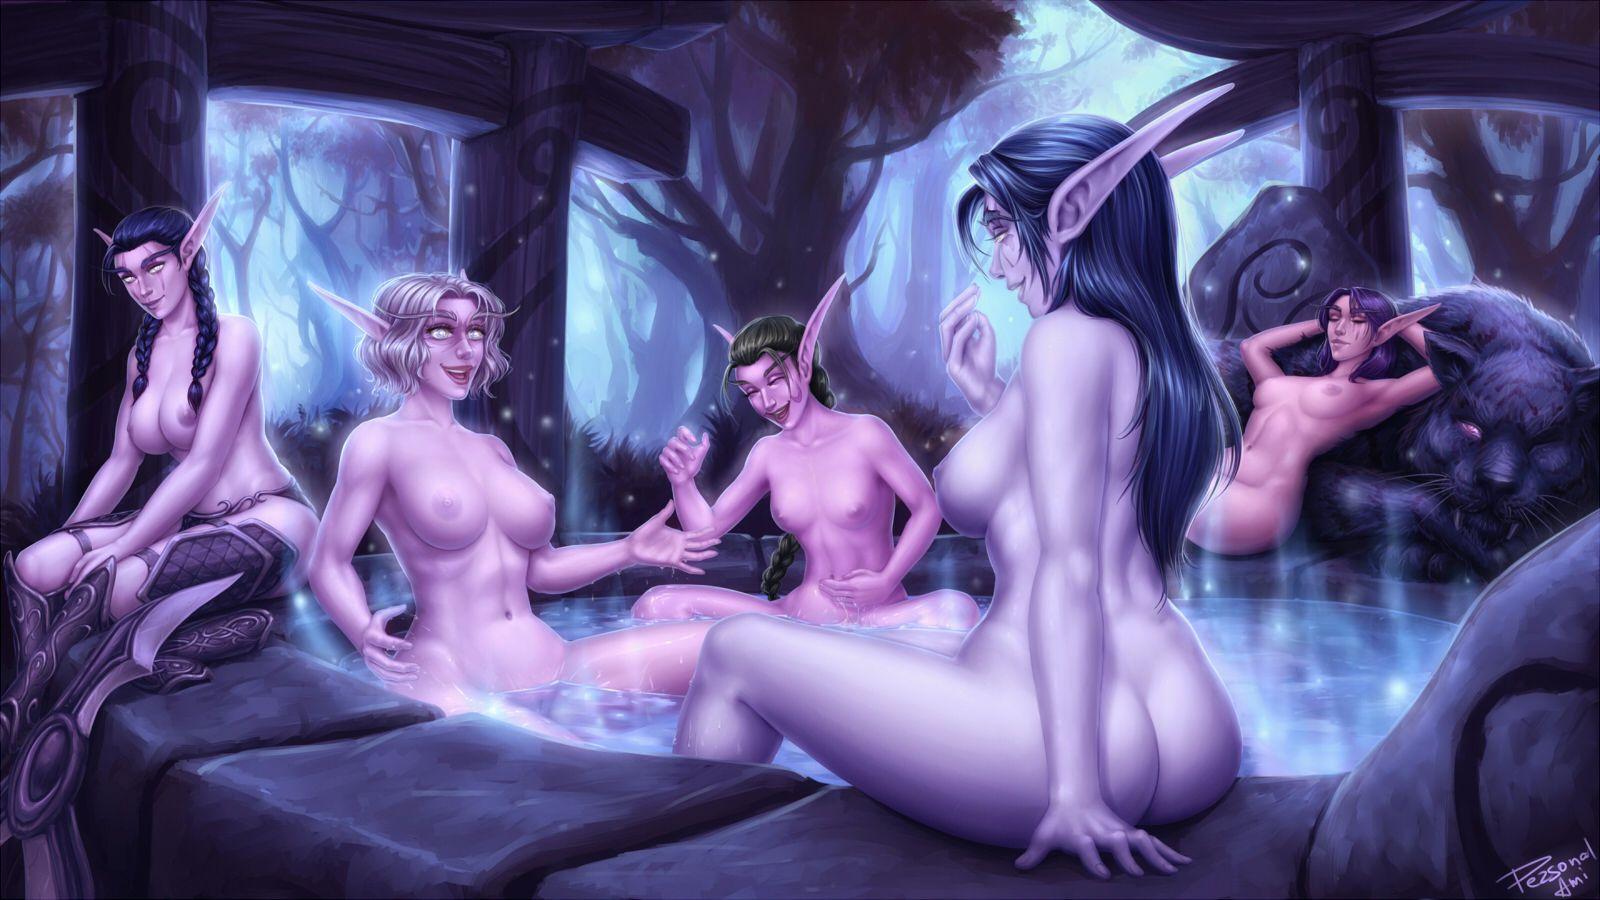 Free nude elven fantasy desktop backgrounds porncraft pictures